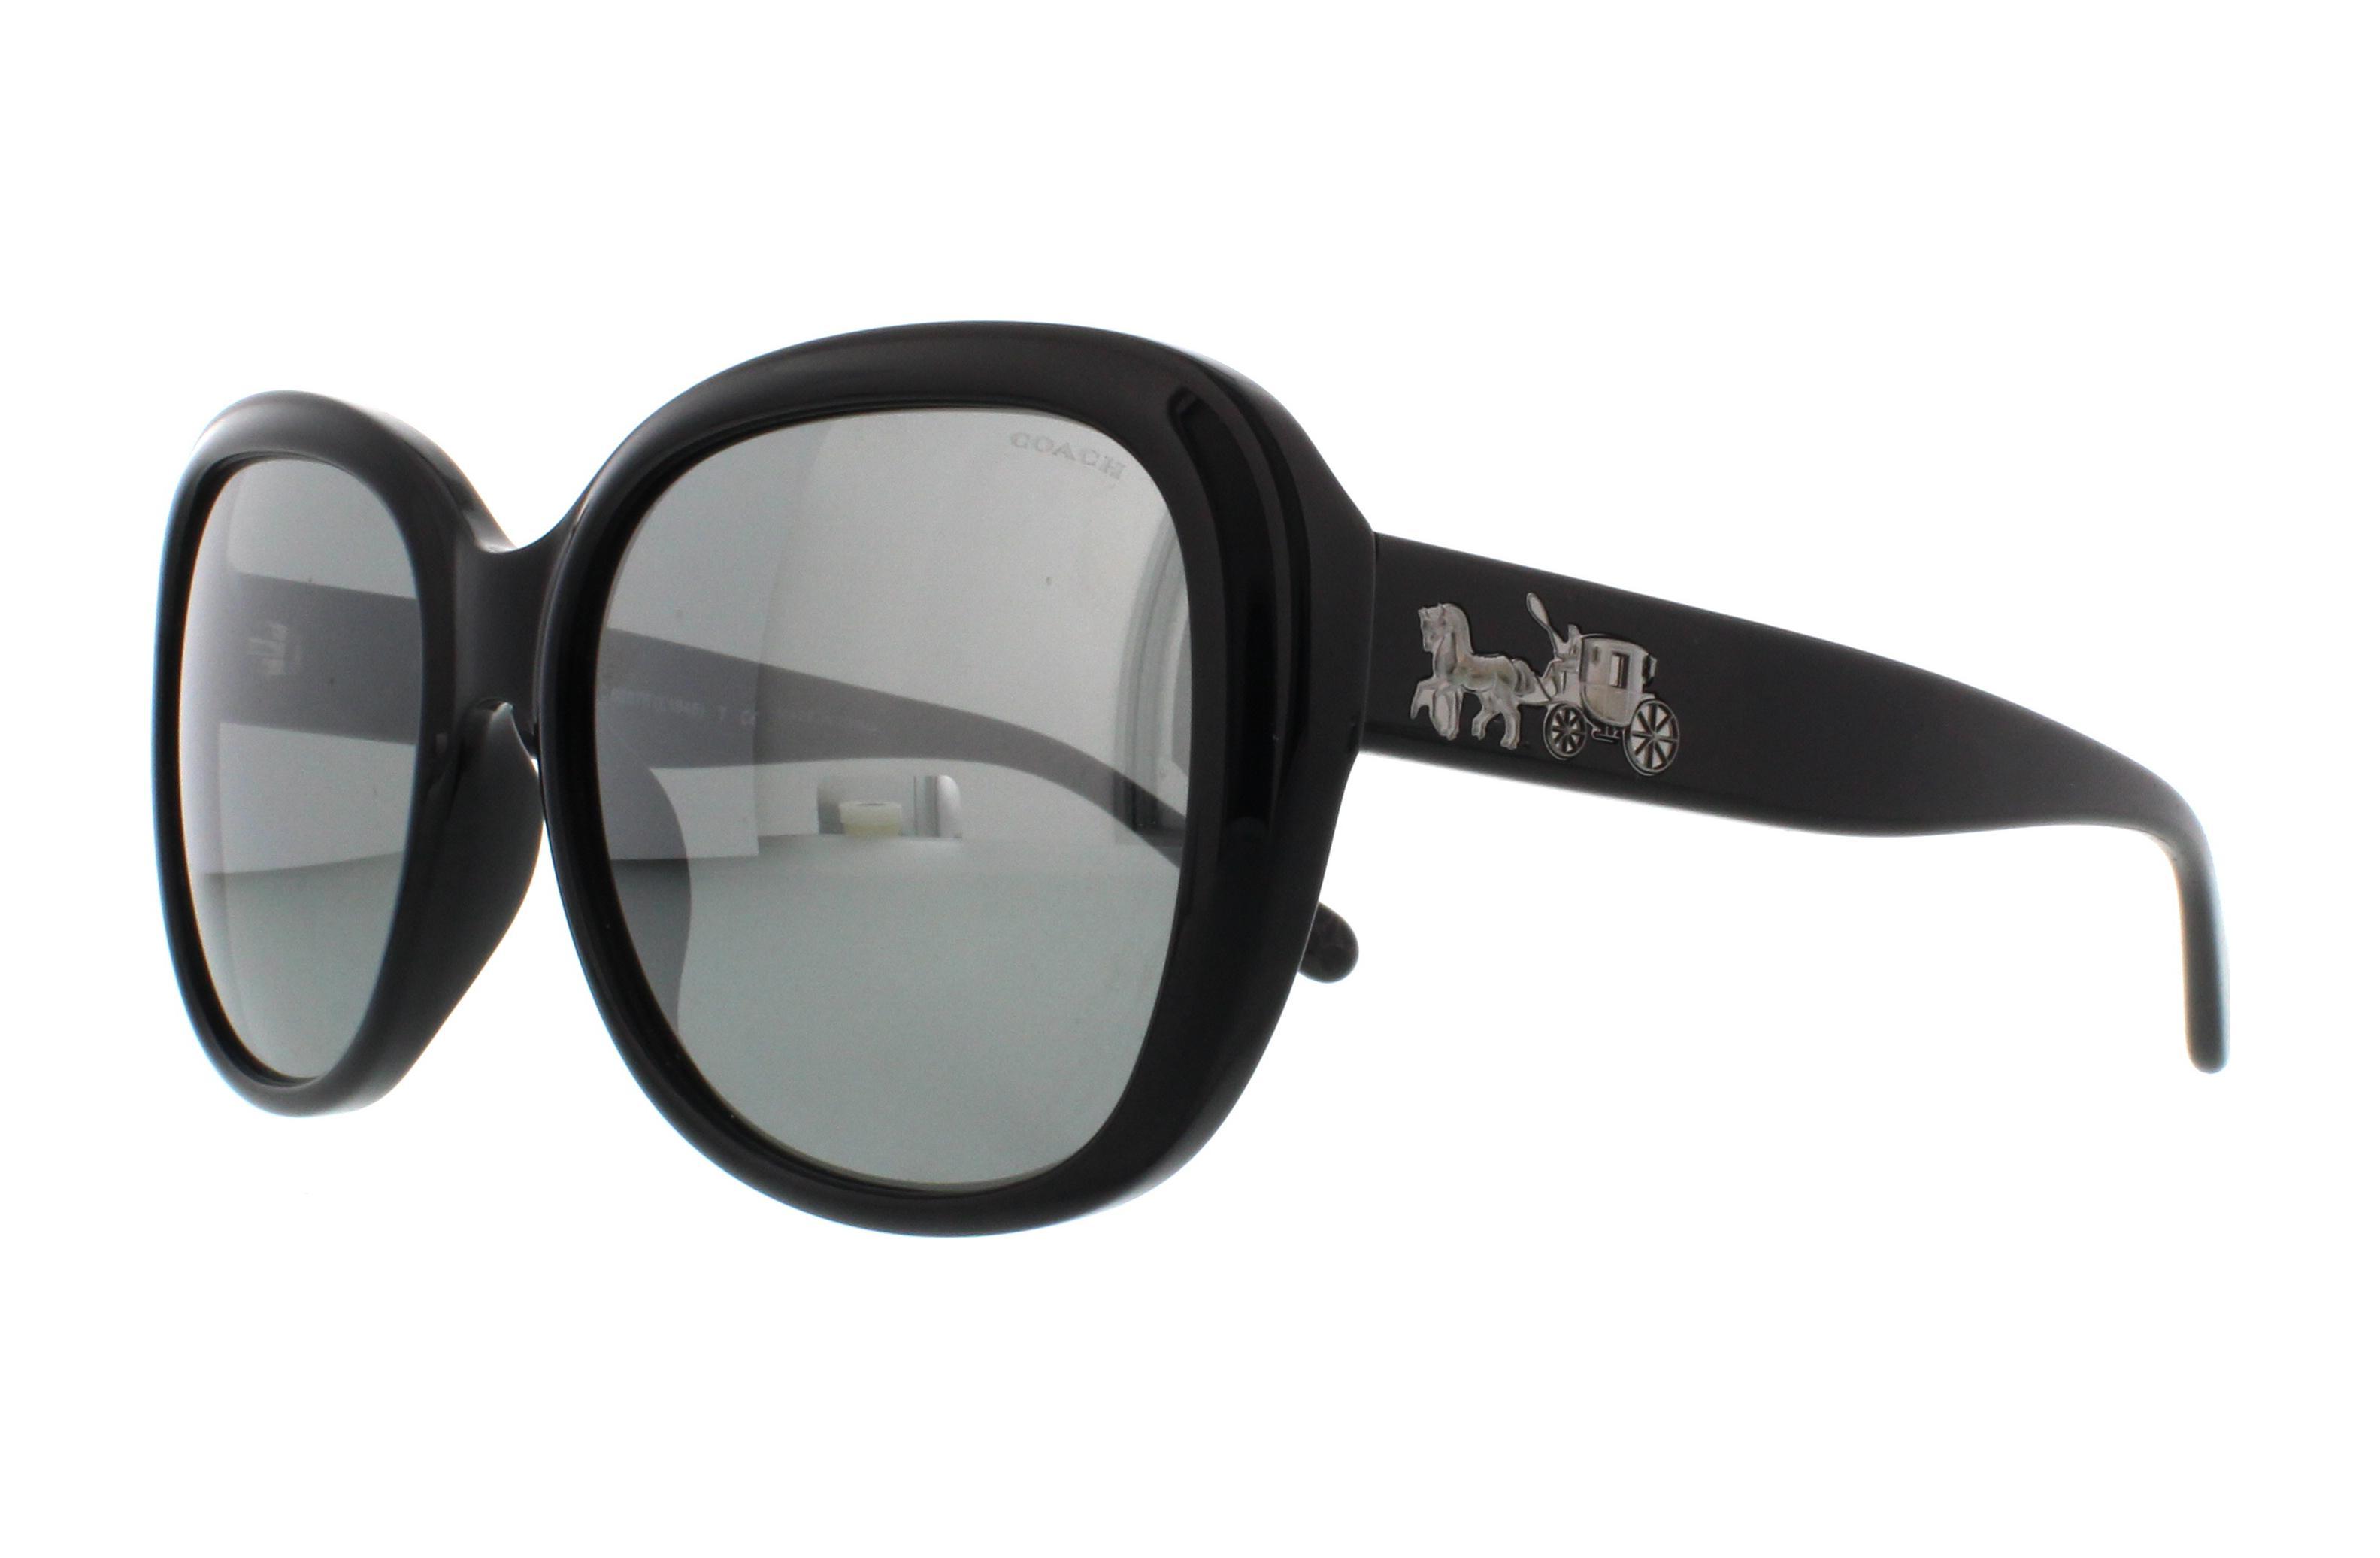 a96c739d488 COACH Sunglasses HC8207F 542011 Black Black Gunmetal Sig C 57MM ...